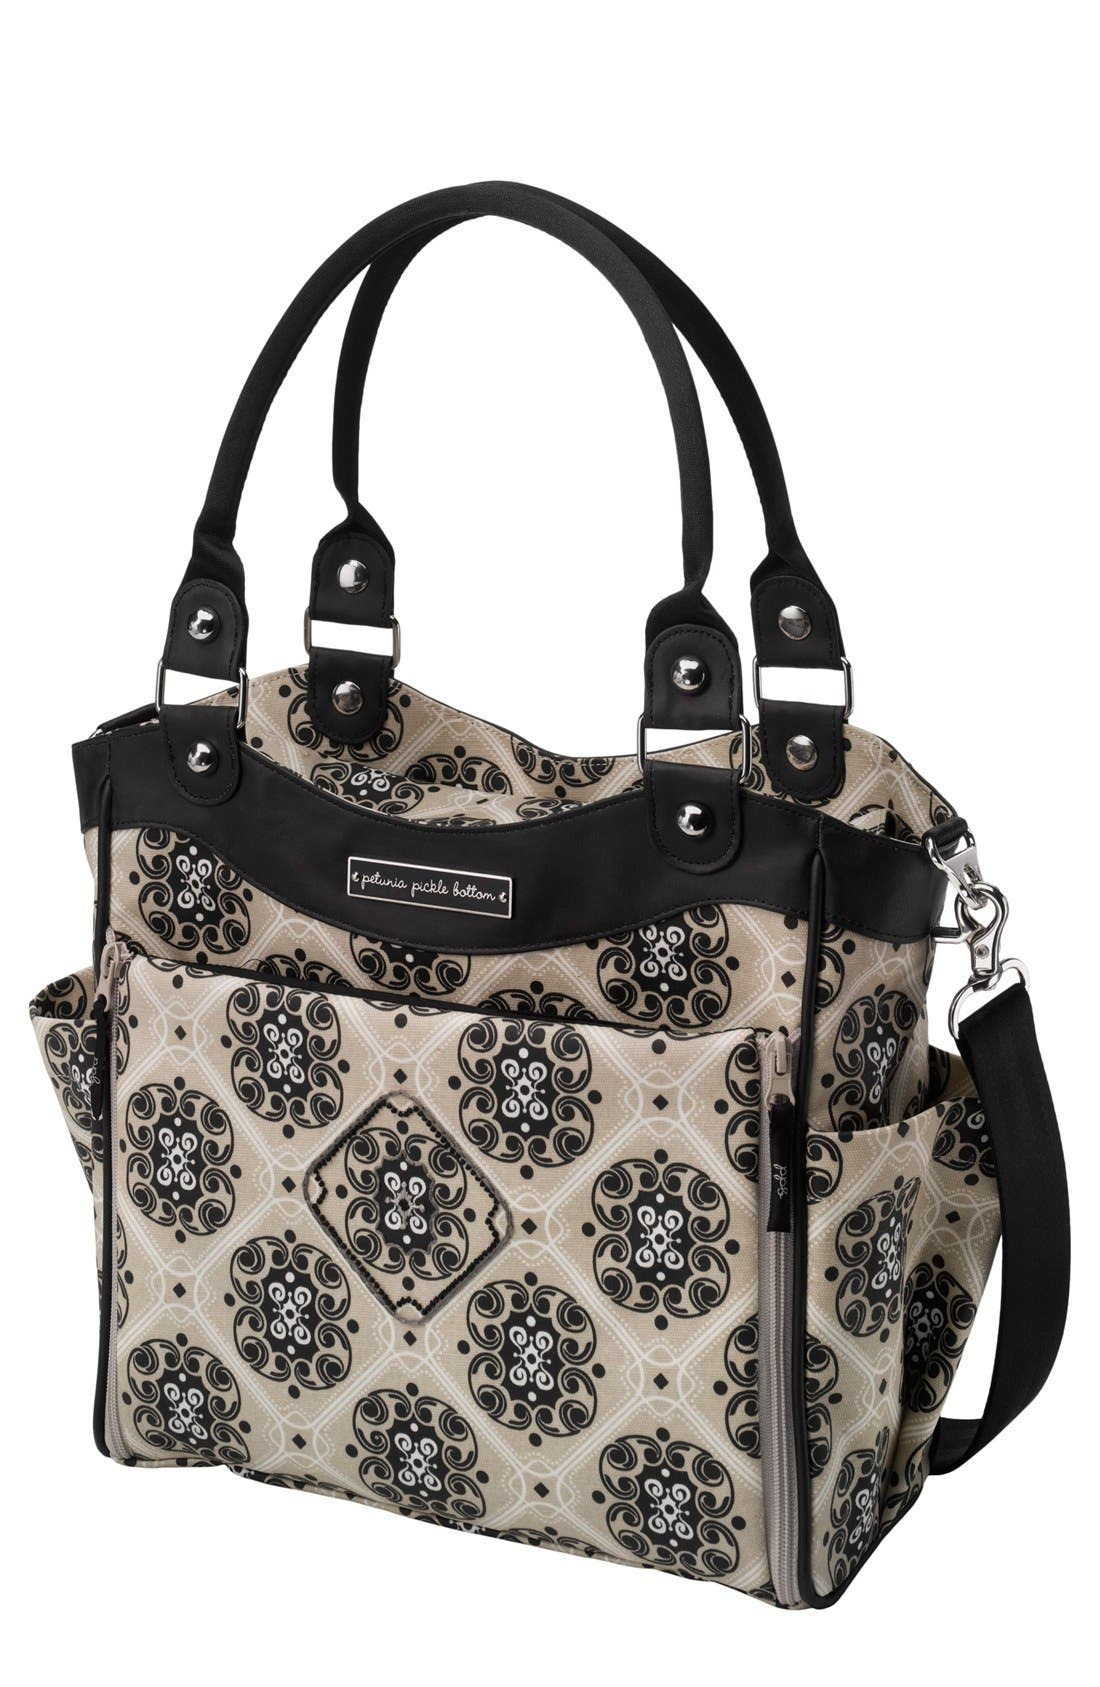 Alternate Image 1 Selected - Petunia Pickle Bottom 'City Carryall' Glazed Diaper Bag